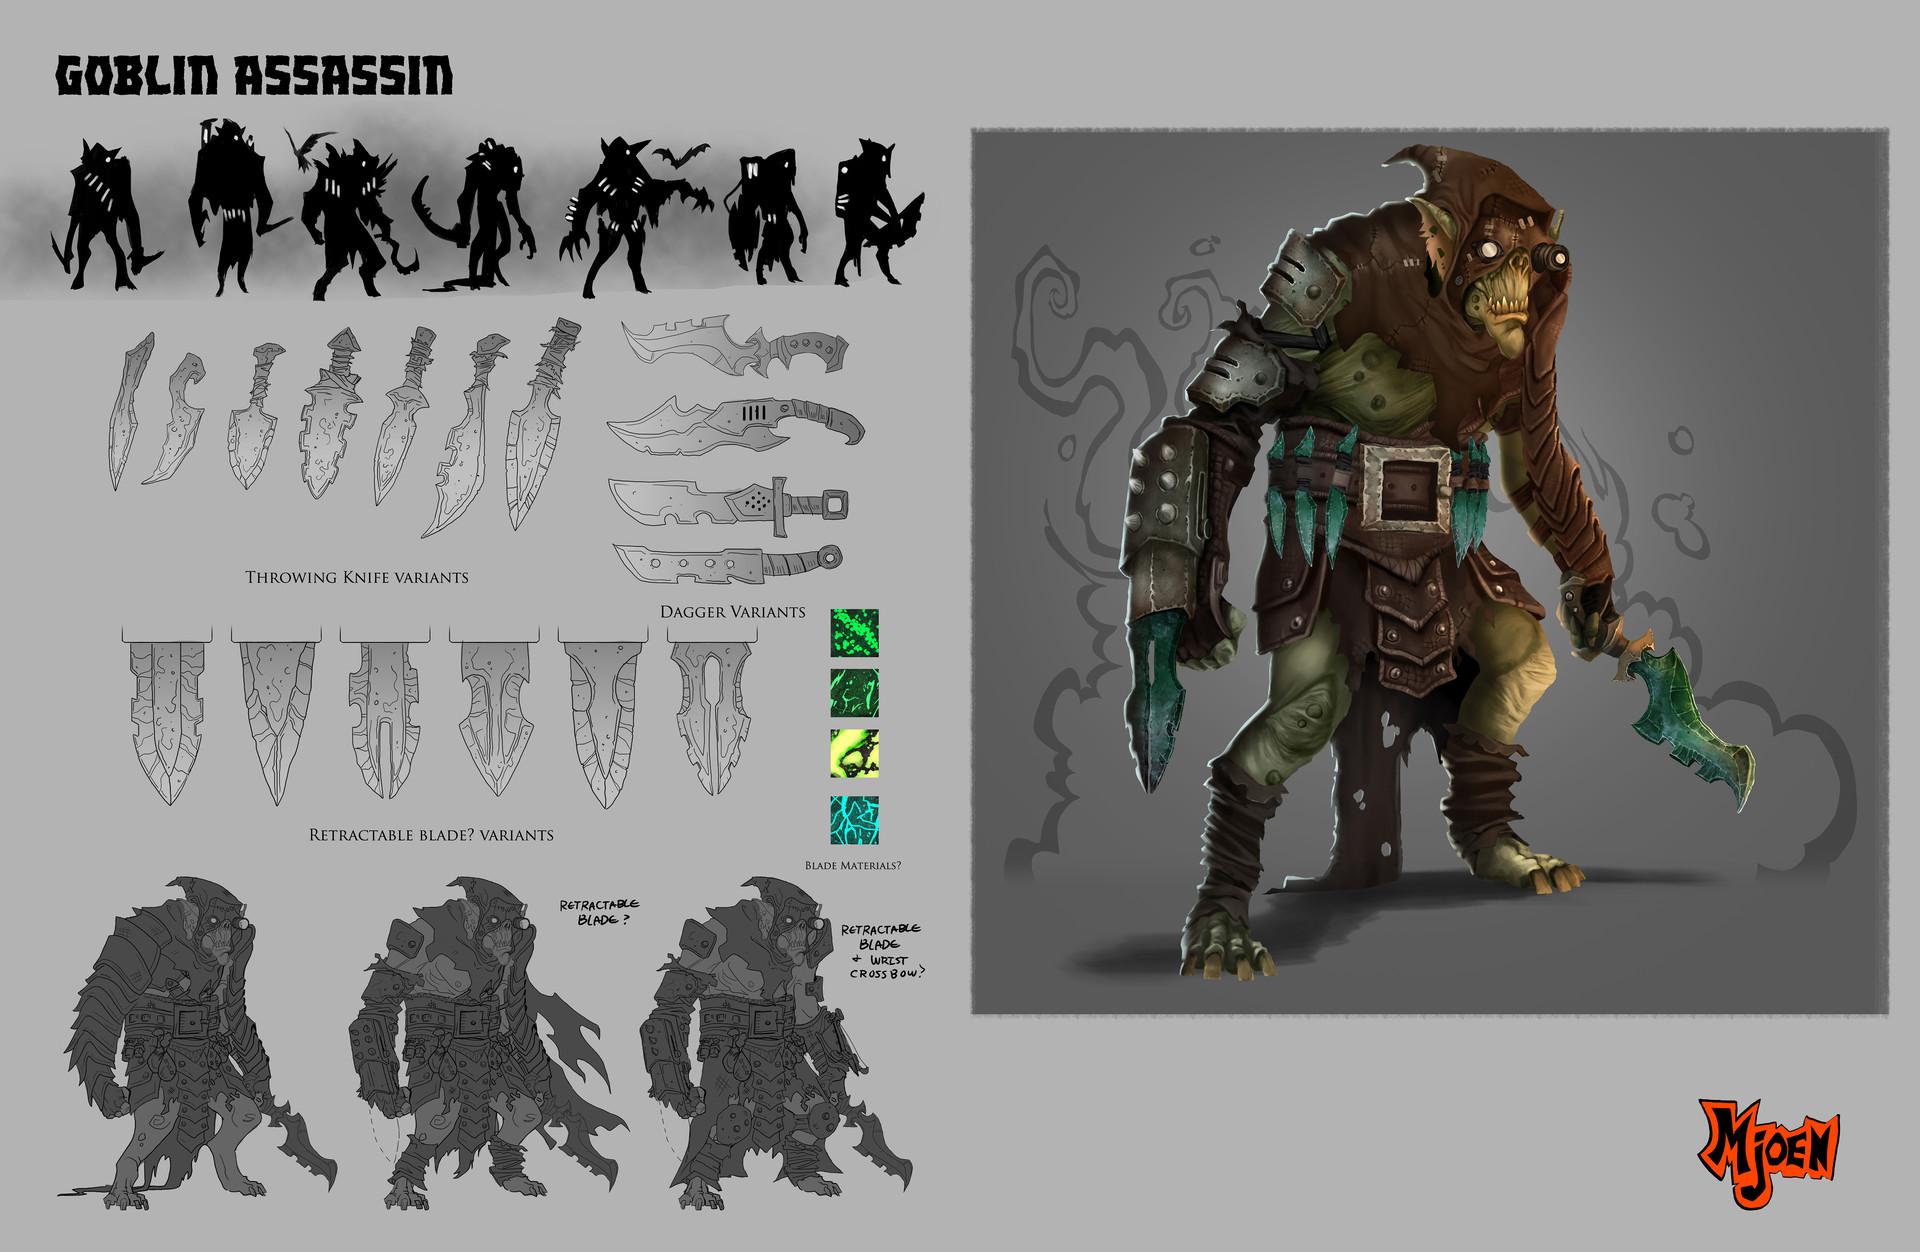 Kyle mjoen assassin goblin sheet